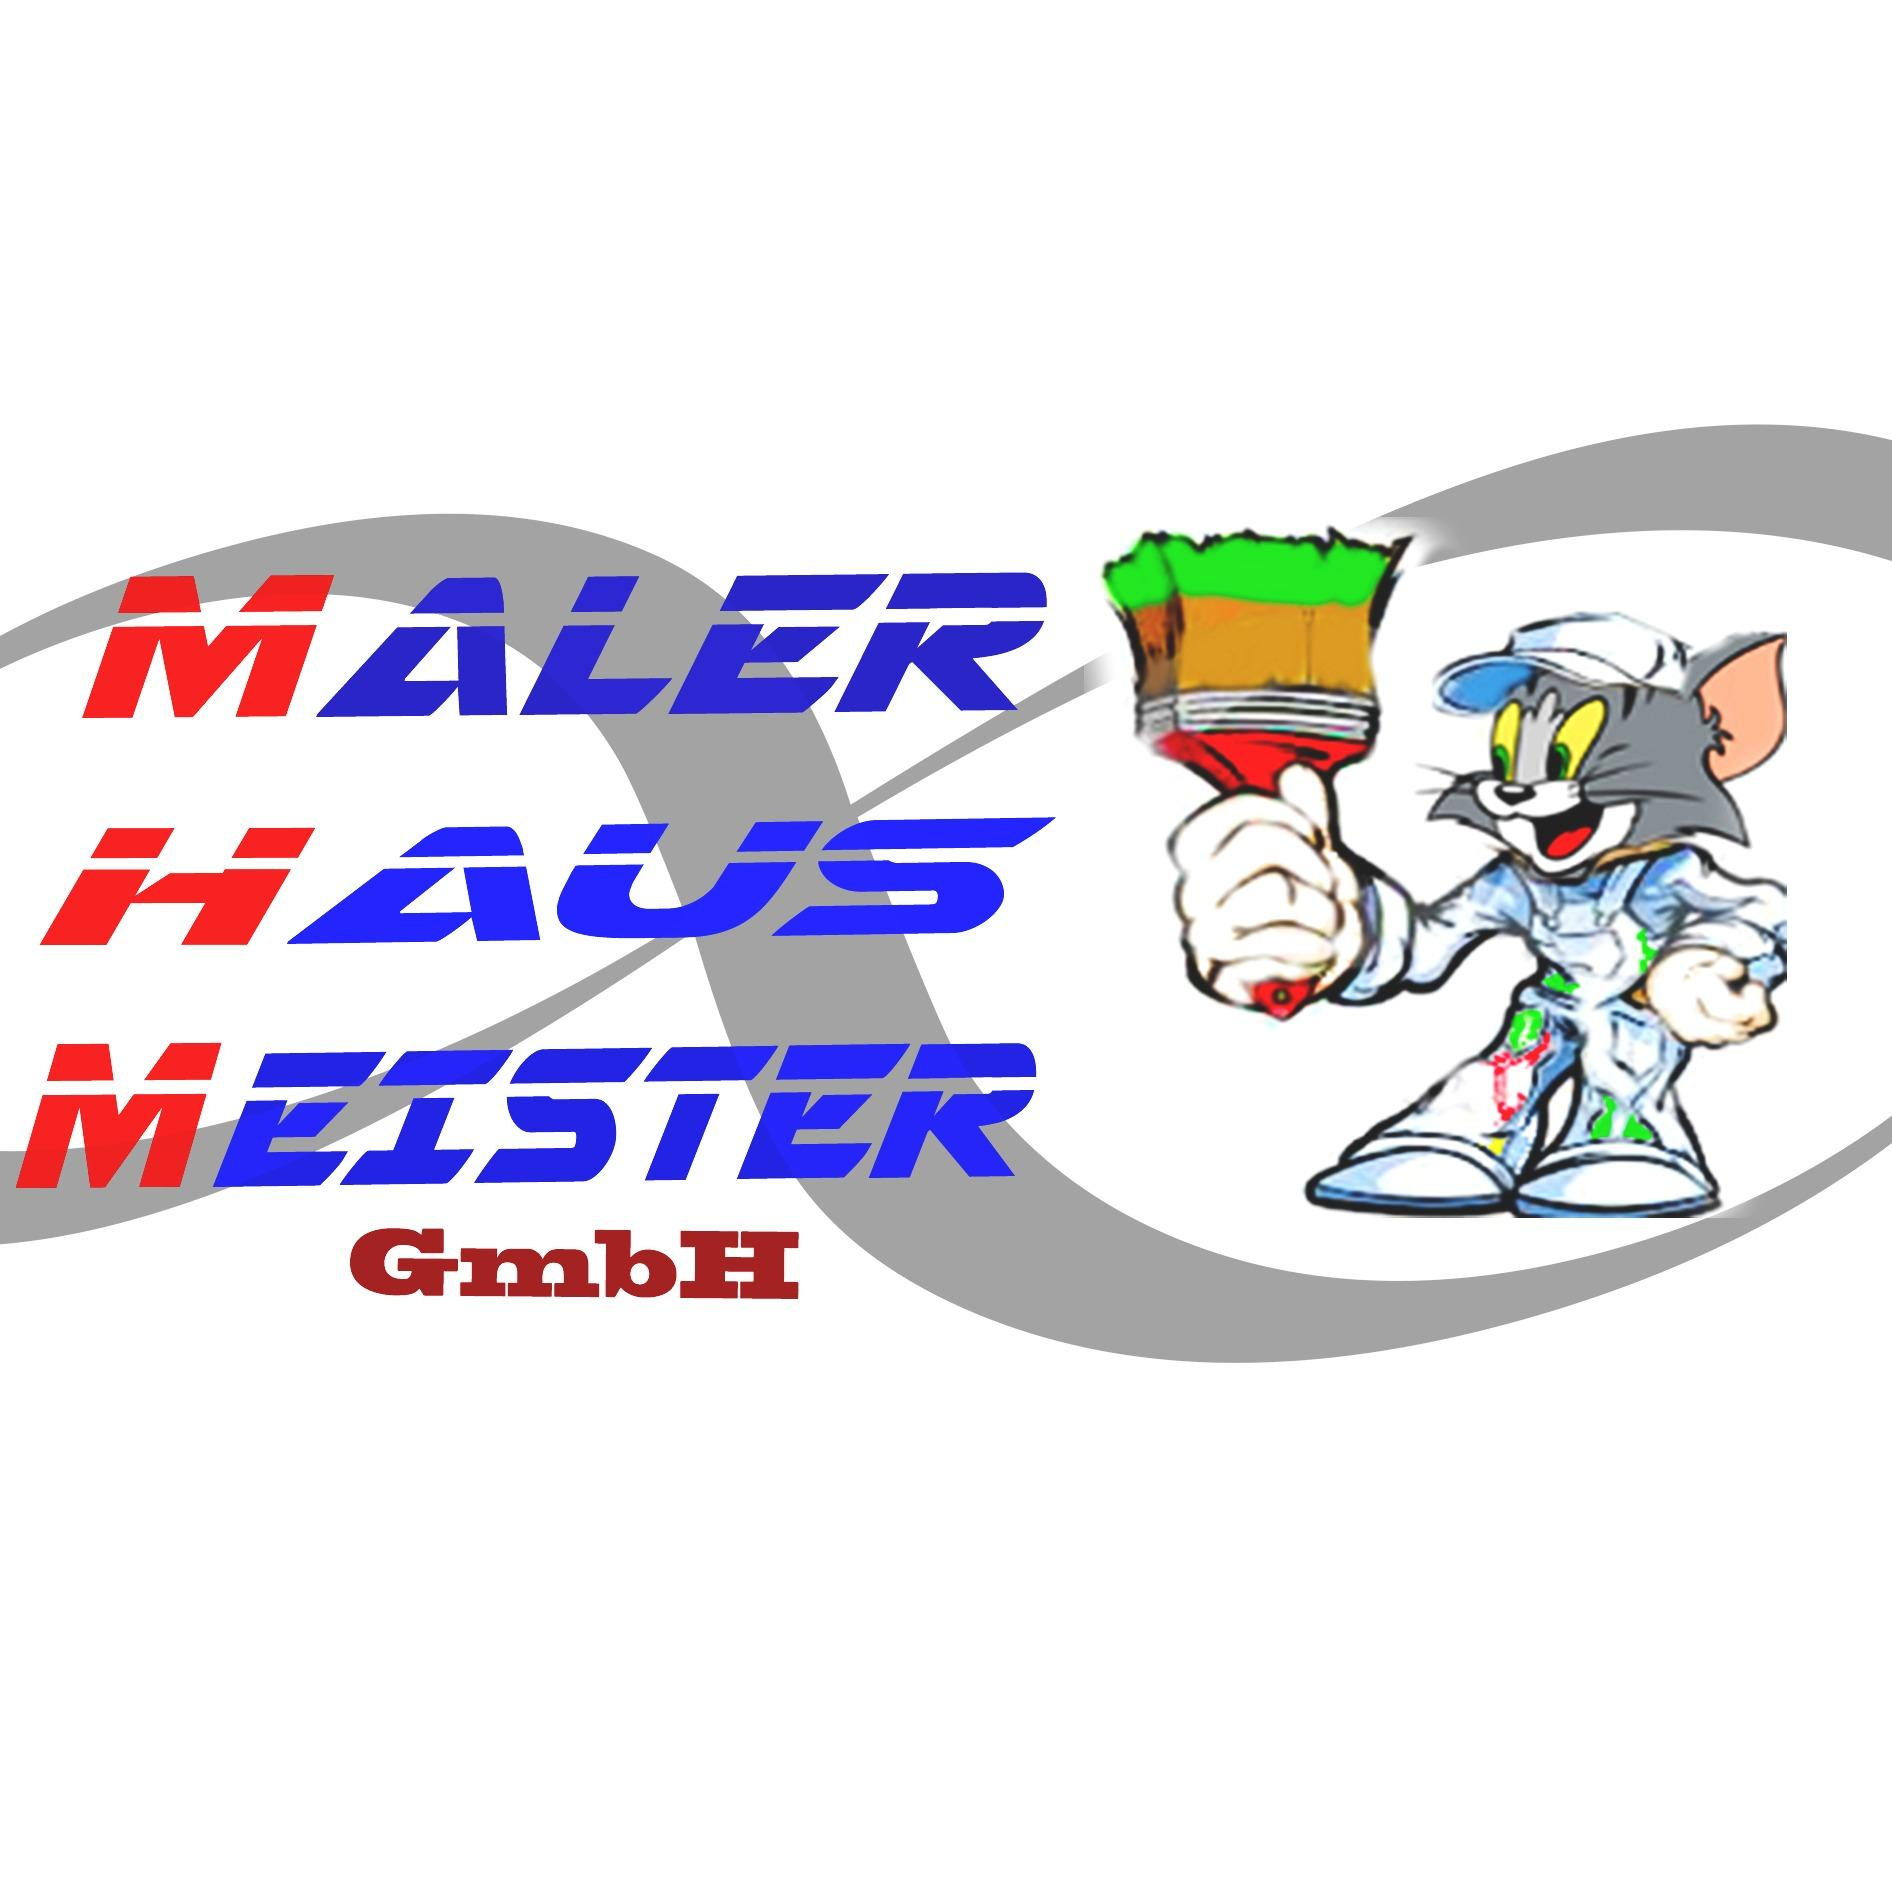 MHM Maler-Haus-Meister GmbH